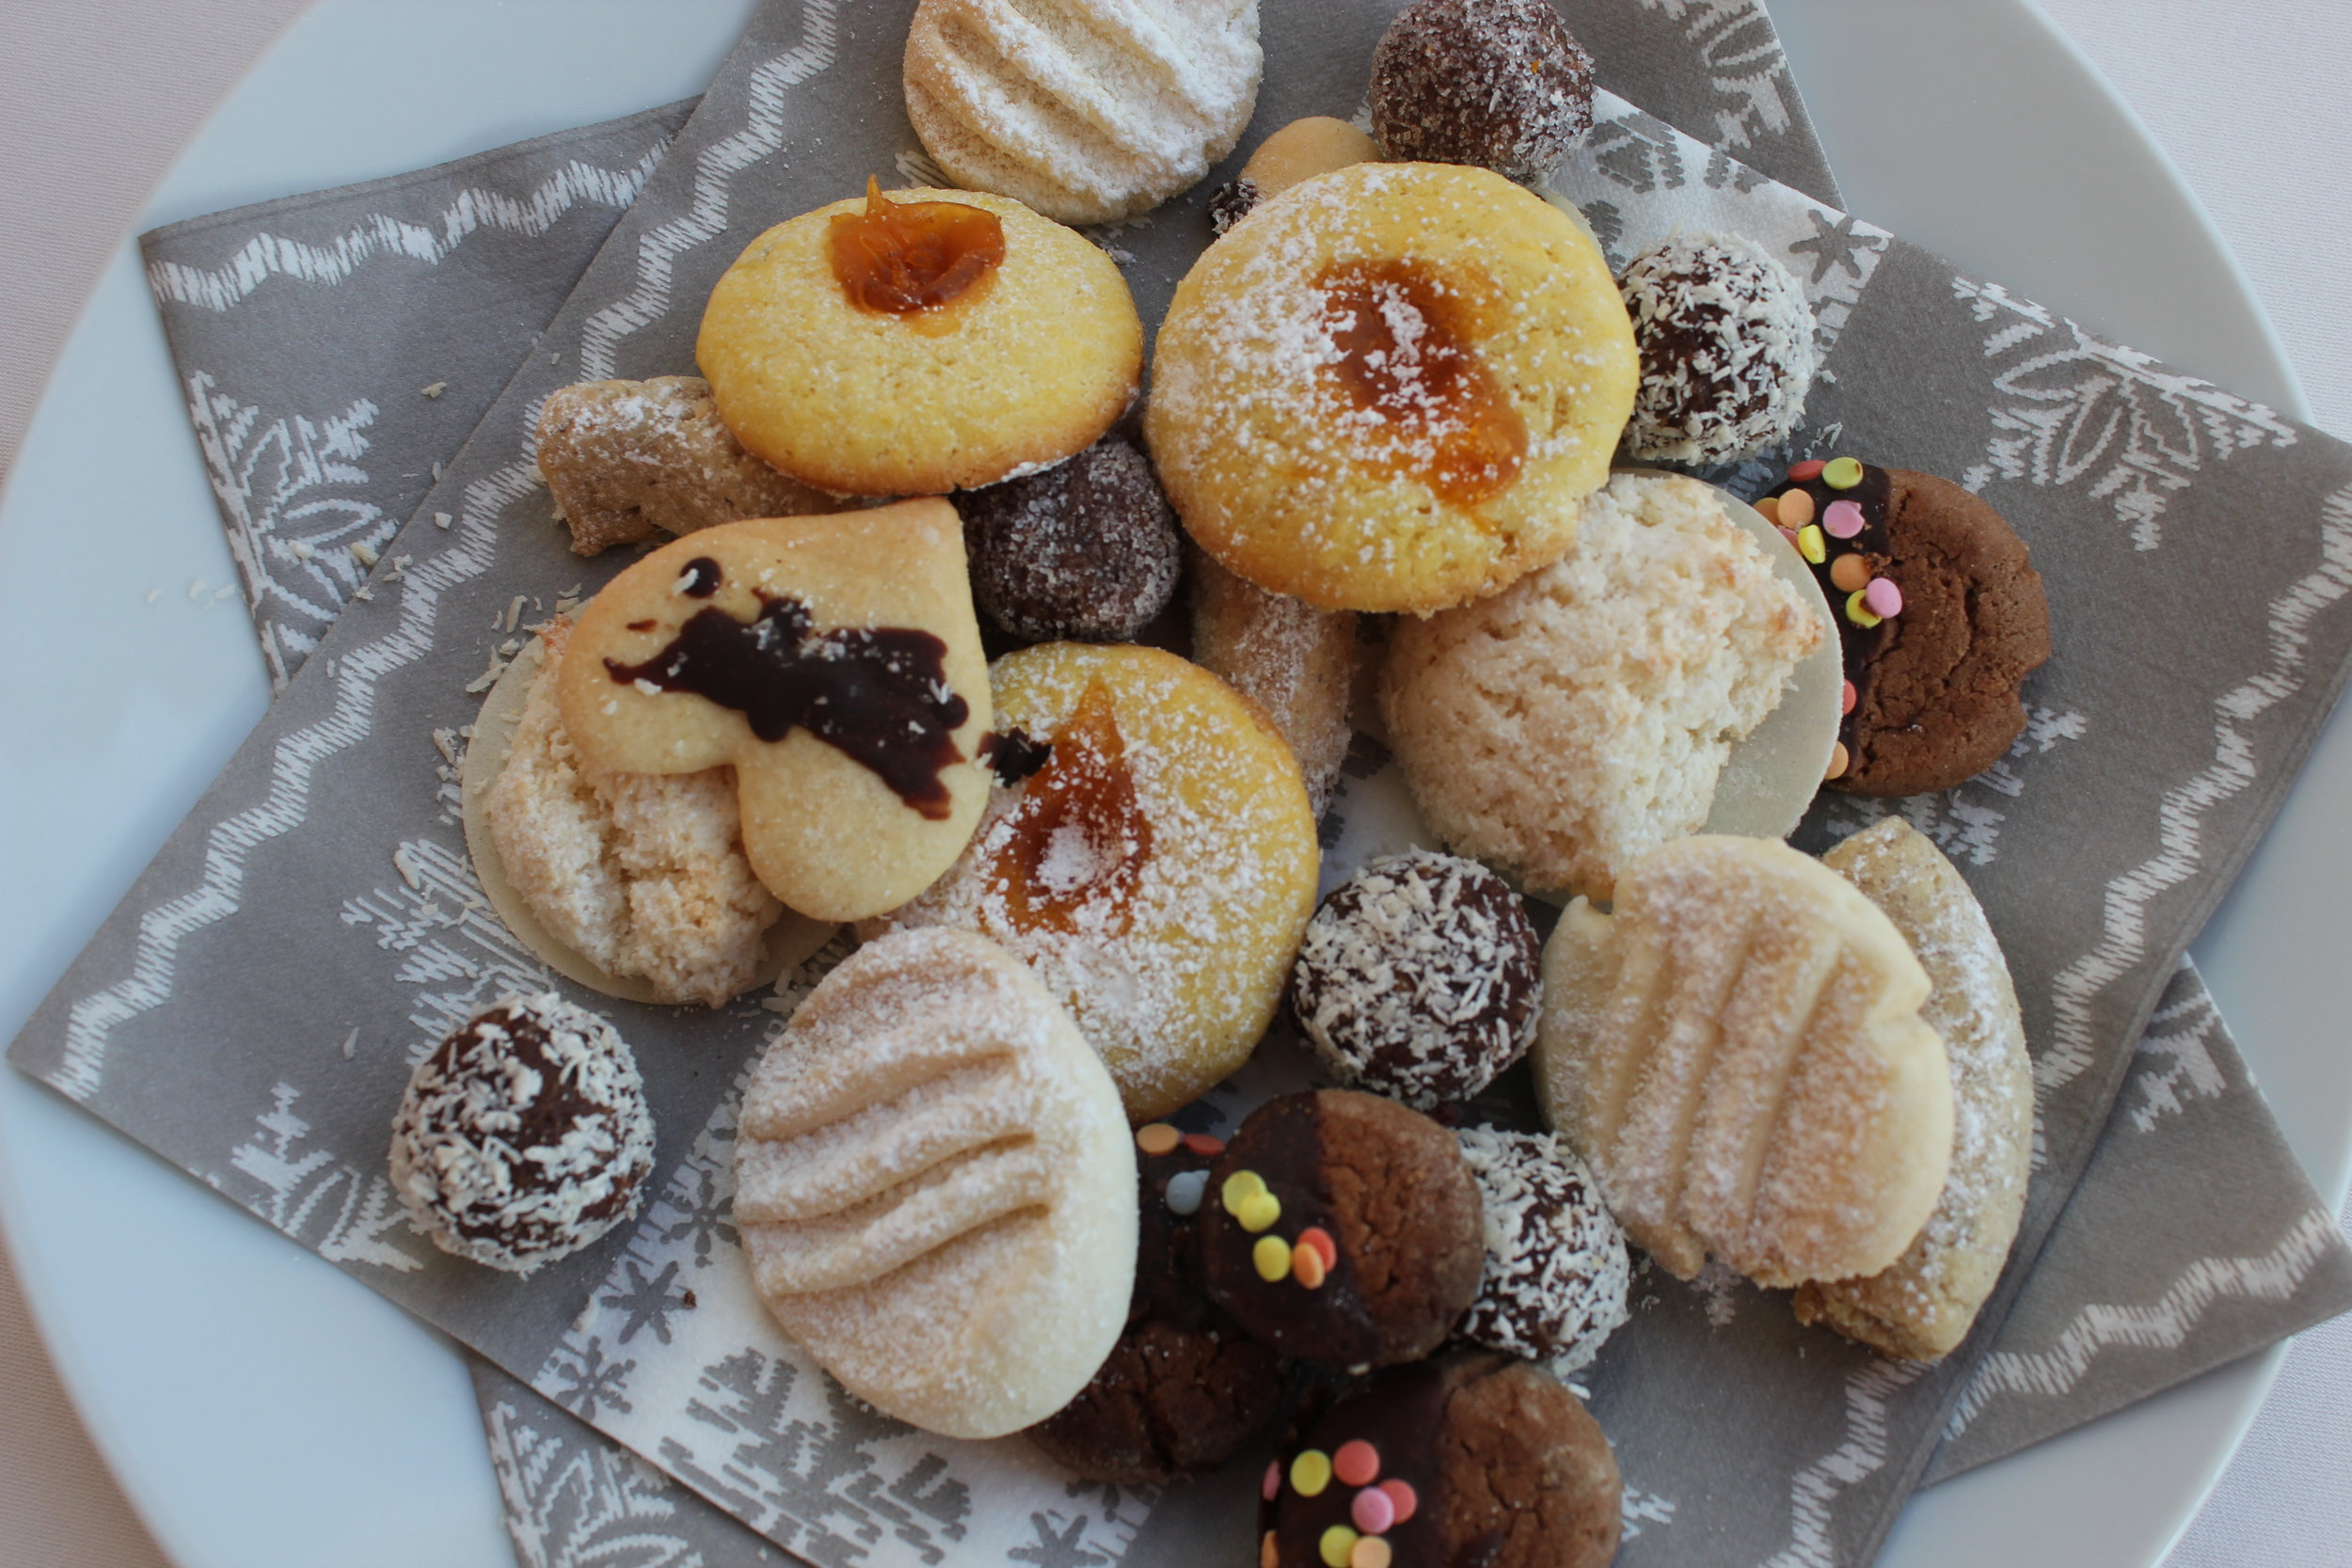 Hausgemachte Weihnachtskekse/Biscotti di natale fatti in casa